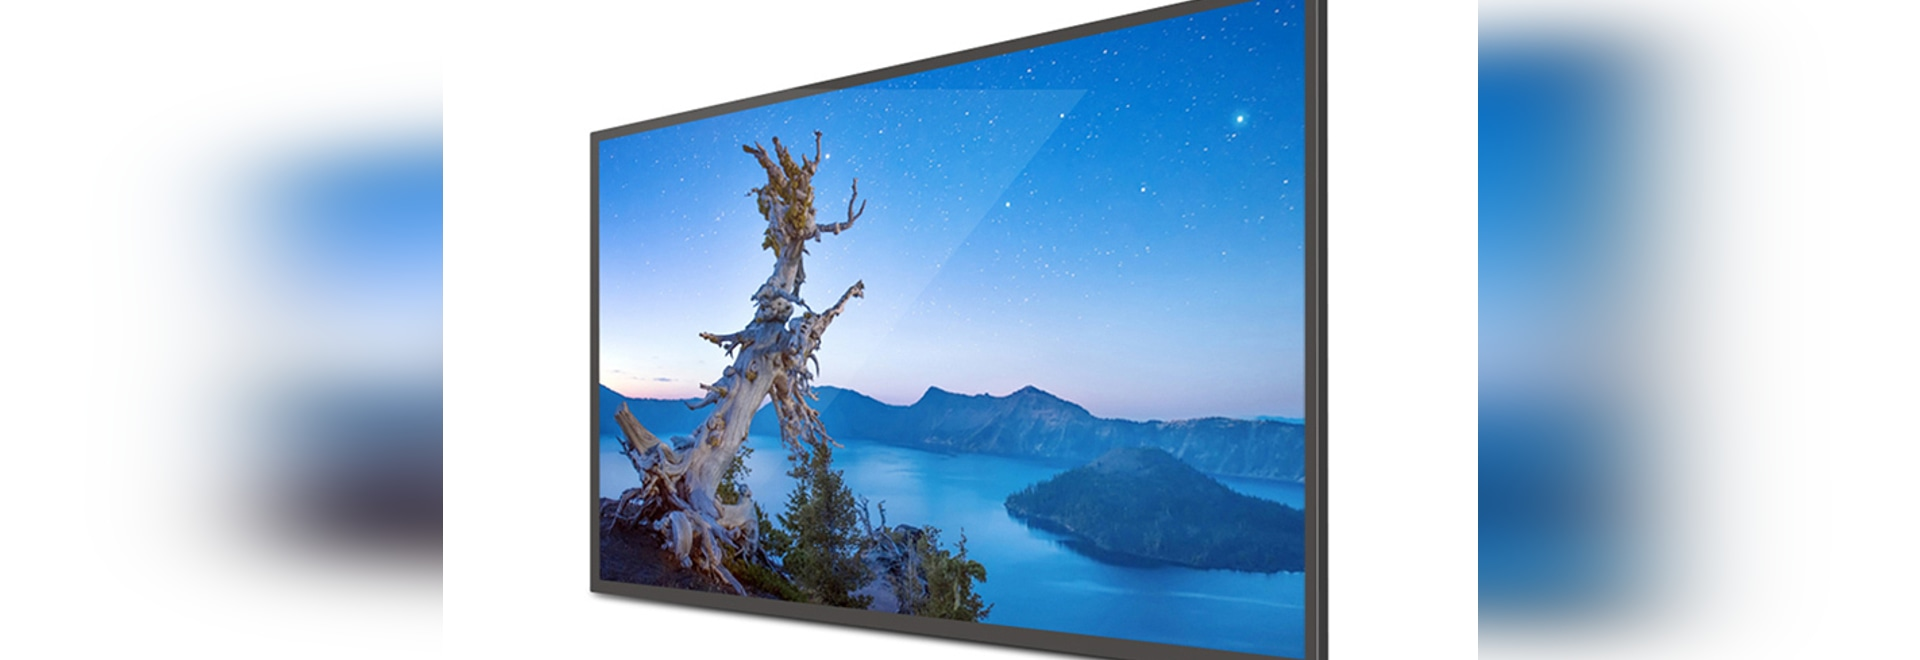 Industrieller kundenspezifischer Touch Screen intelligenter Android - Tablet PC